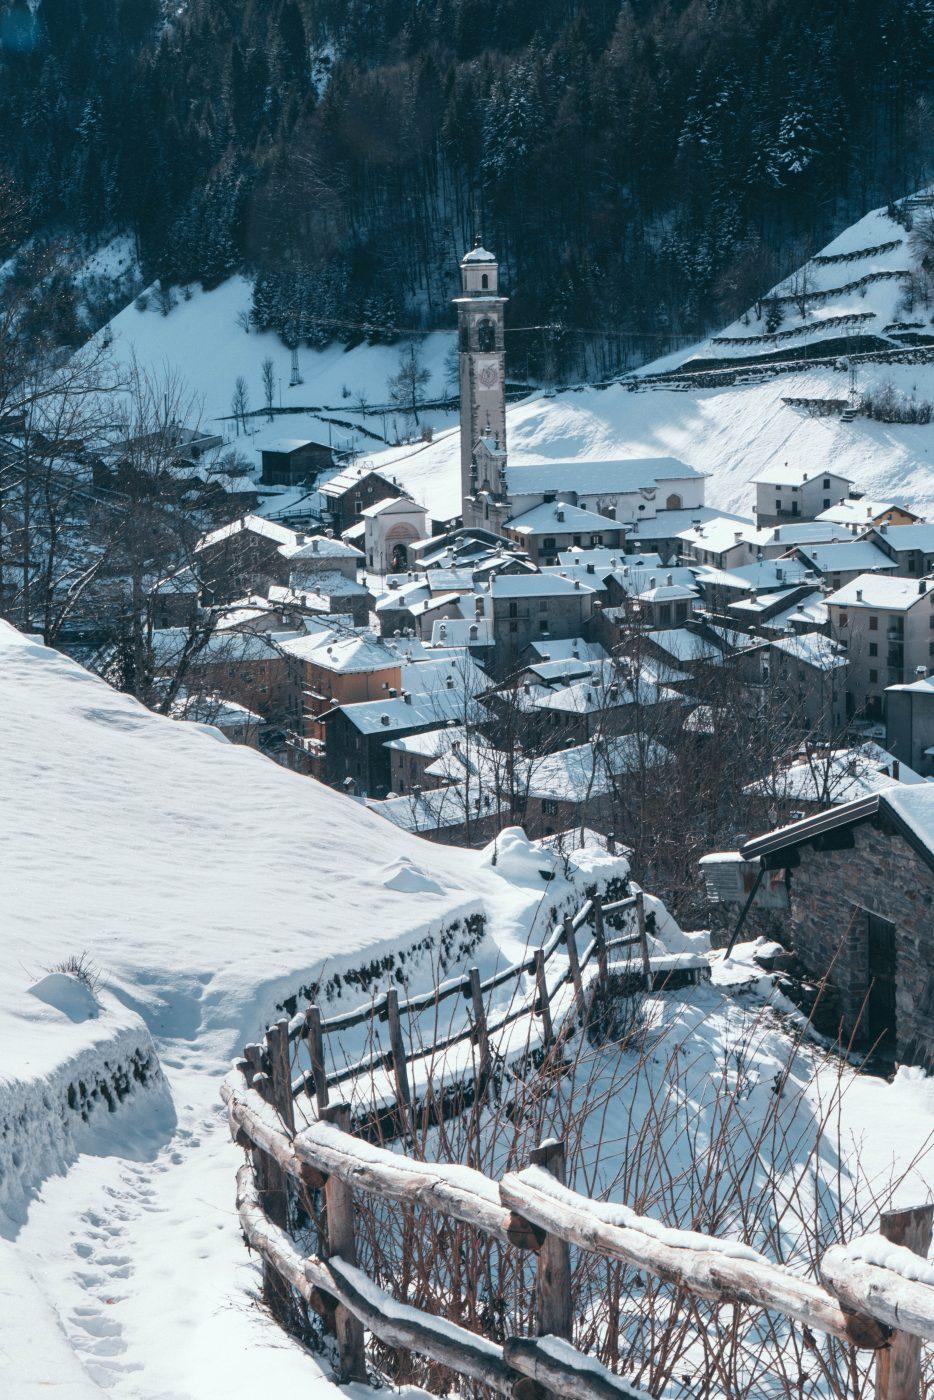 Snowshoe hike to Gerola Alta, Valgerola, Valtellina